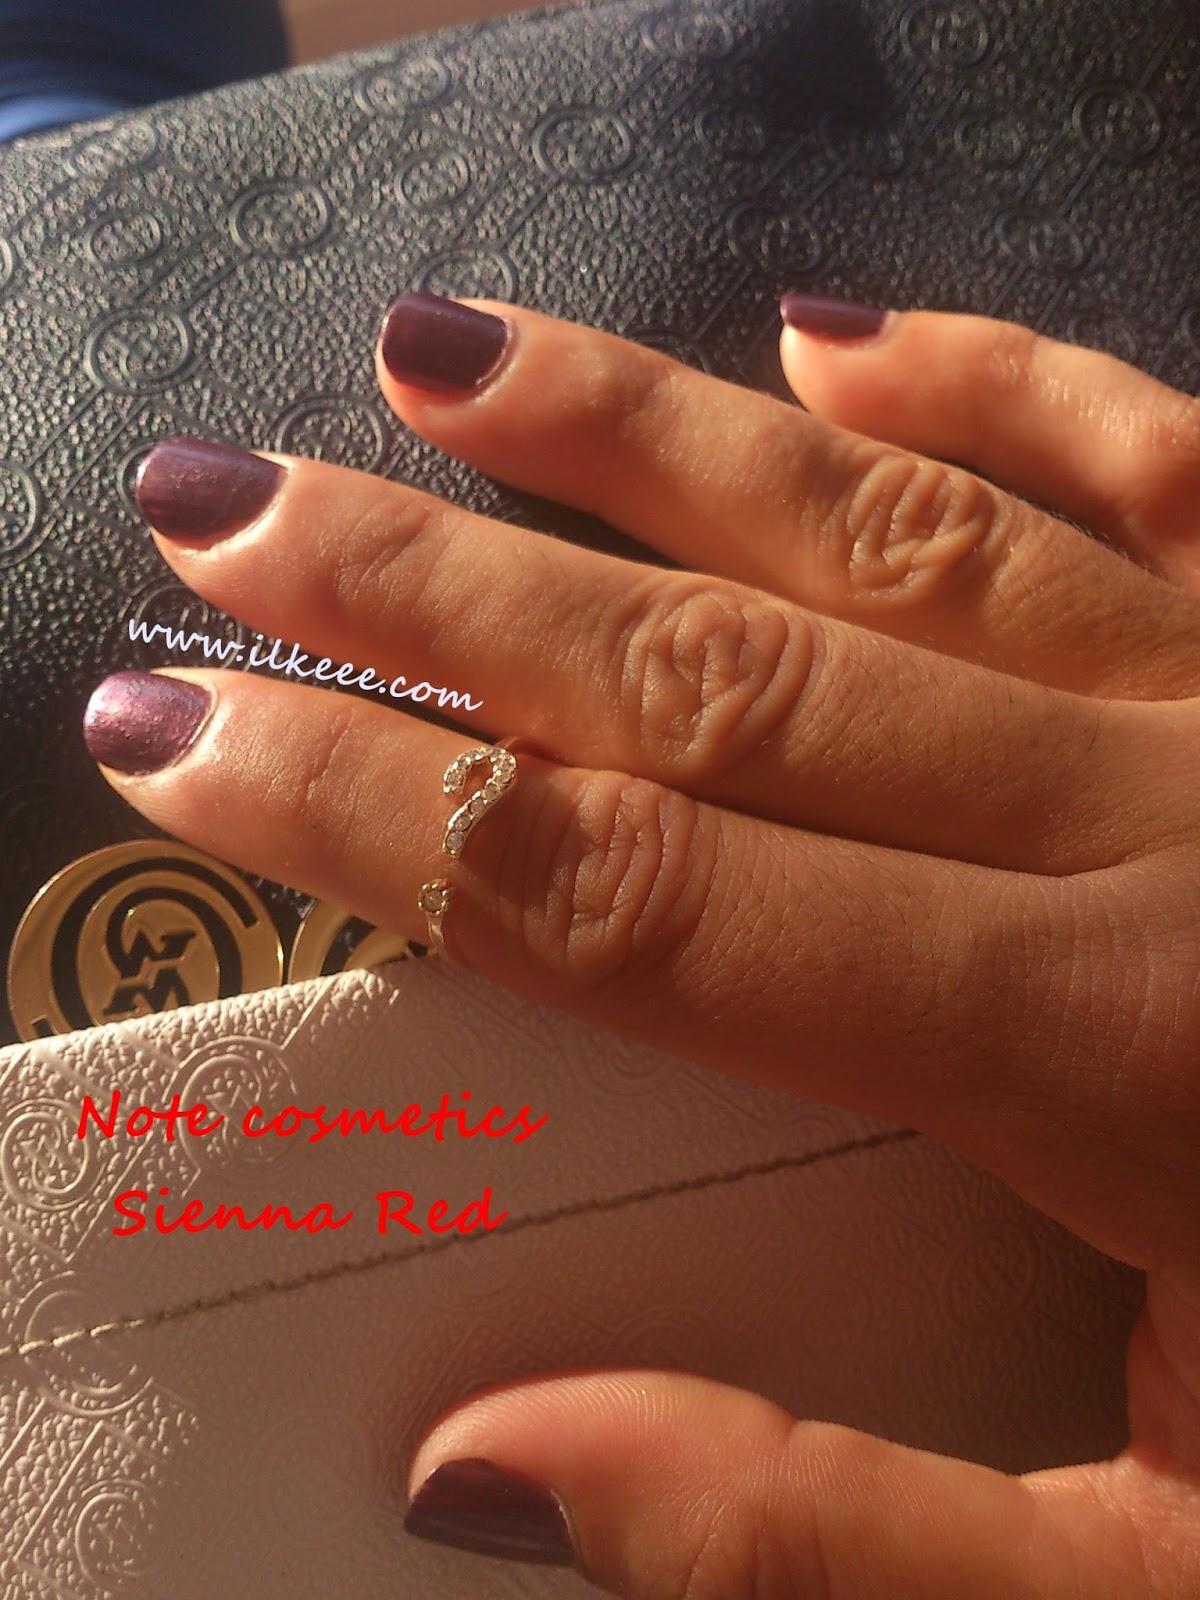 Note Cosmetics - Nail Polish - Sienna Red Oje - Note Ojeleri Kullananlar